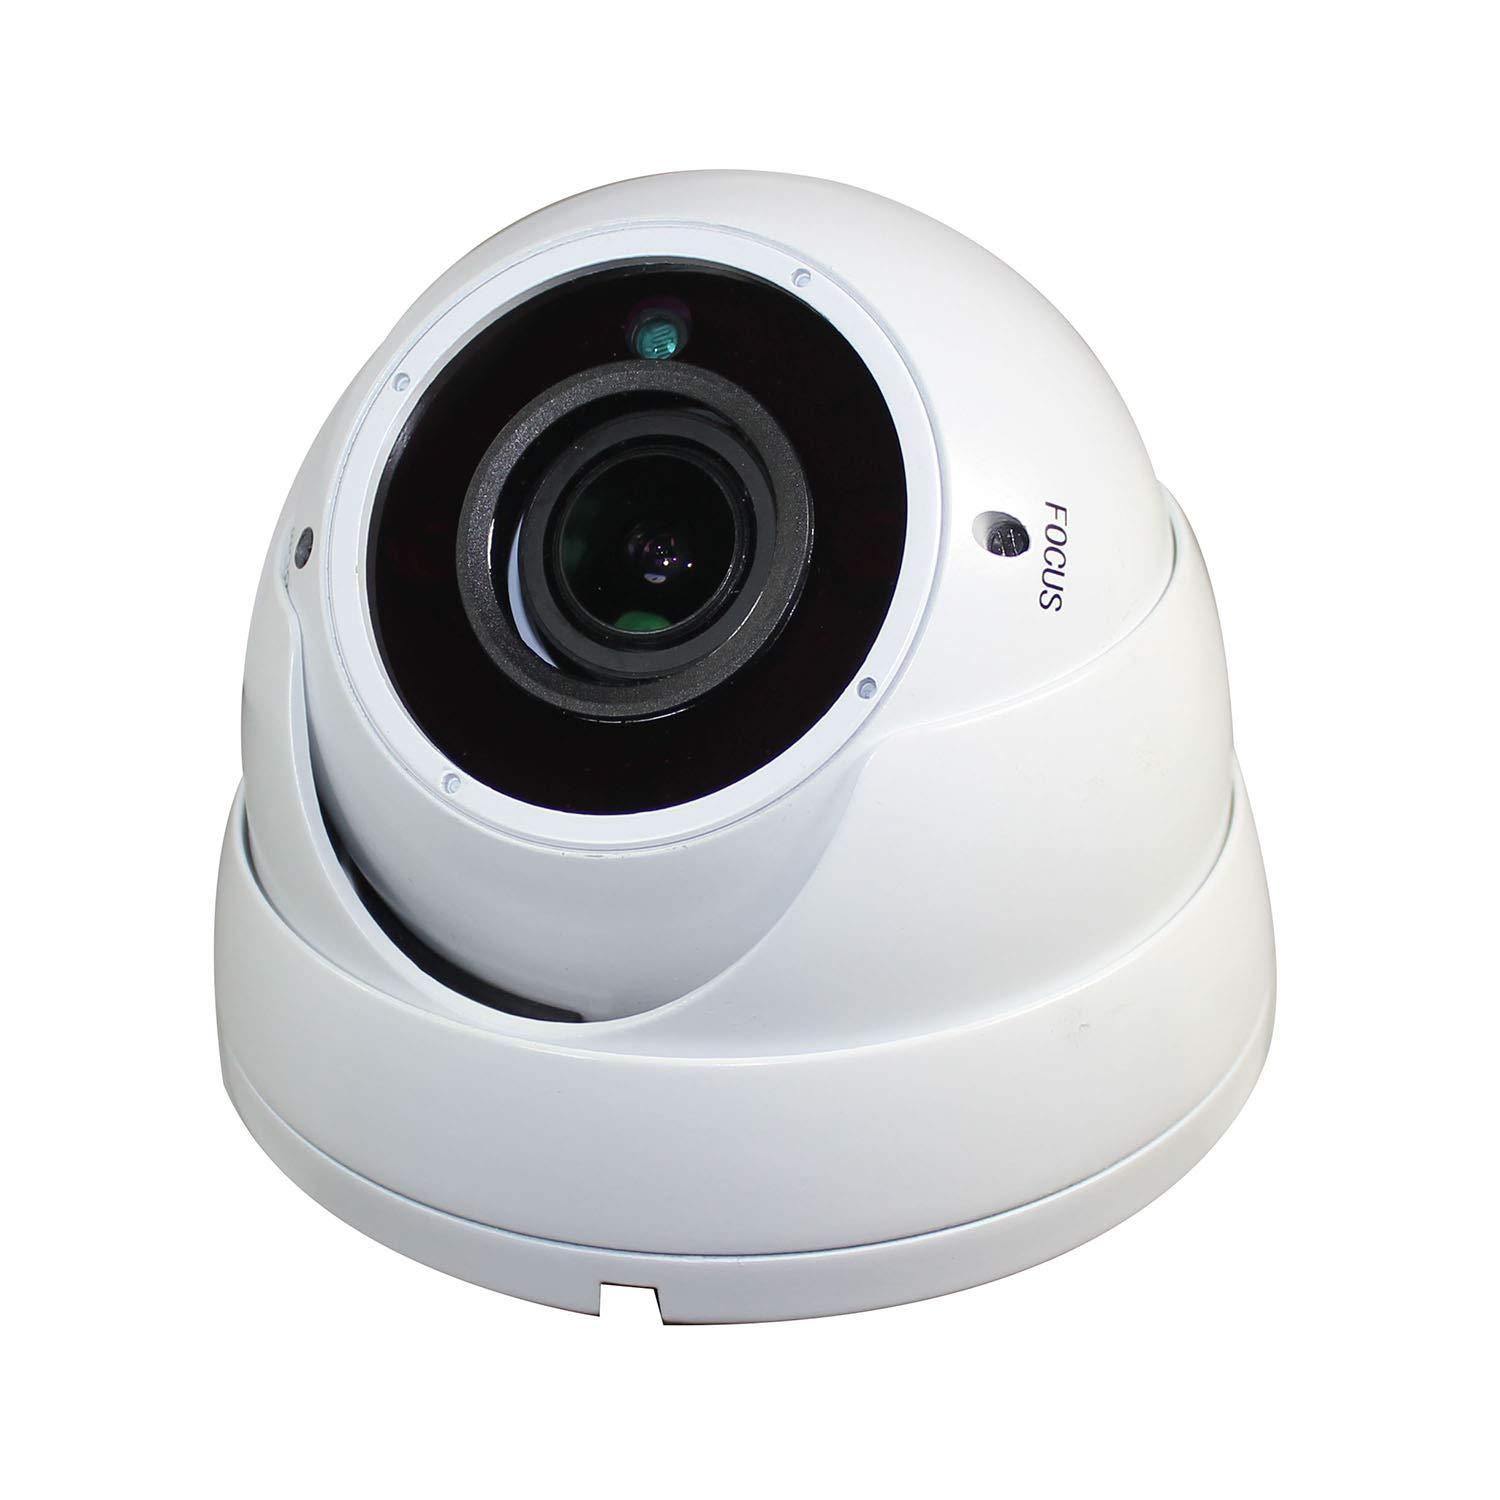 Sinis Security Hybrid C/ámara de vigilancia de seguridad de 5 MP 4 MP 1080P HD-TVI//CVI//AHD//960H CCTV sistema de v/ídeo c/úpula de metal resistente al agua para exterior//interior 2,8-12 mm